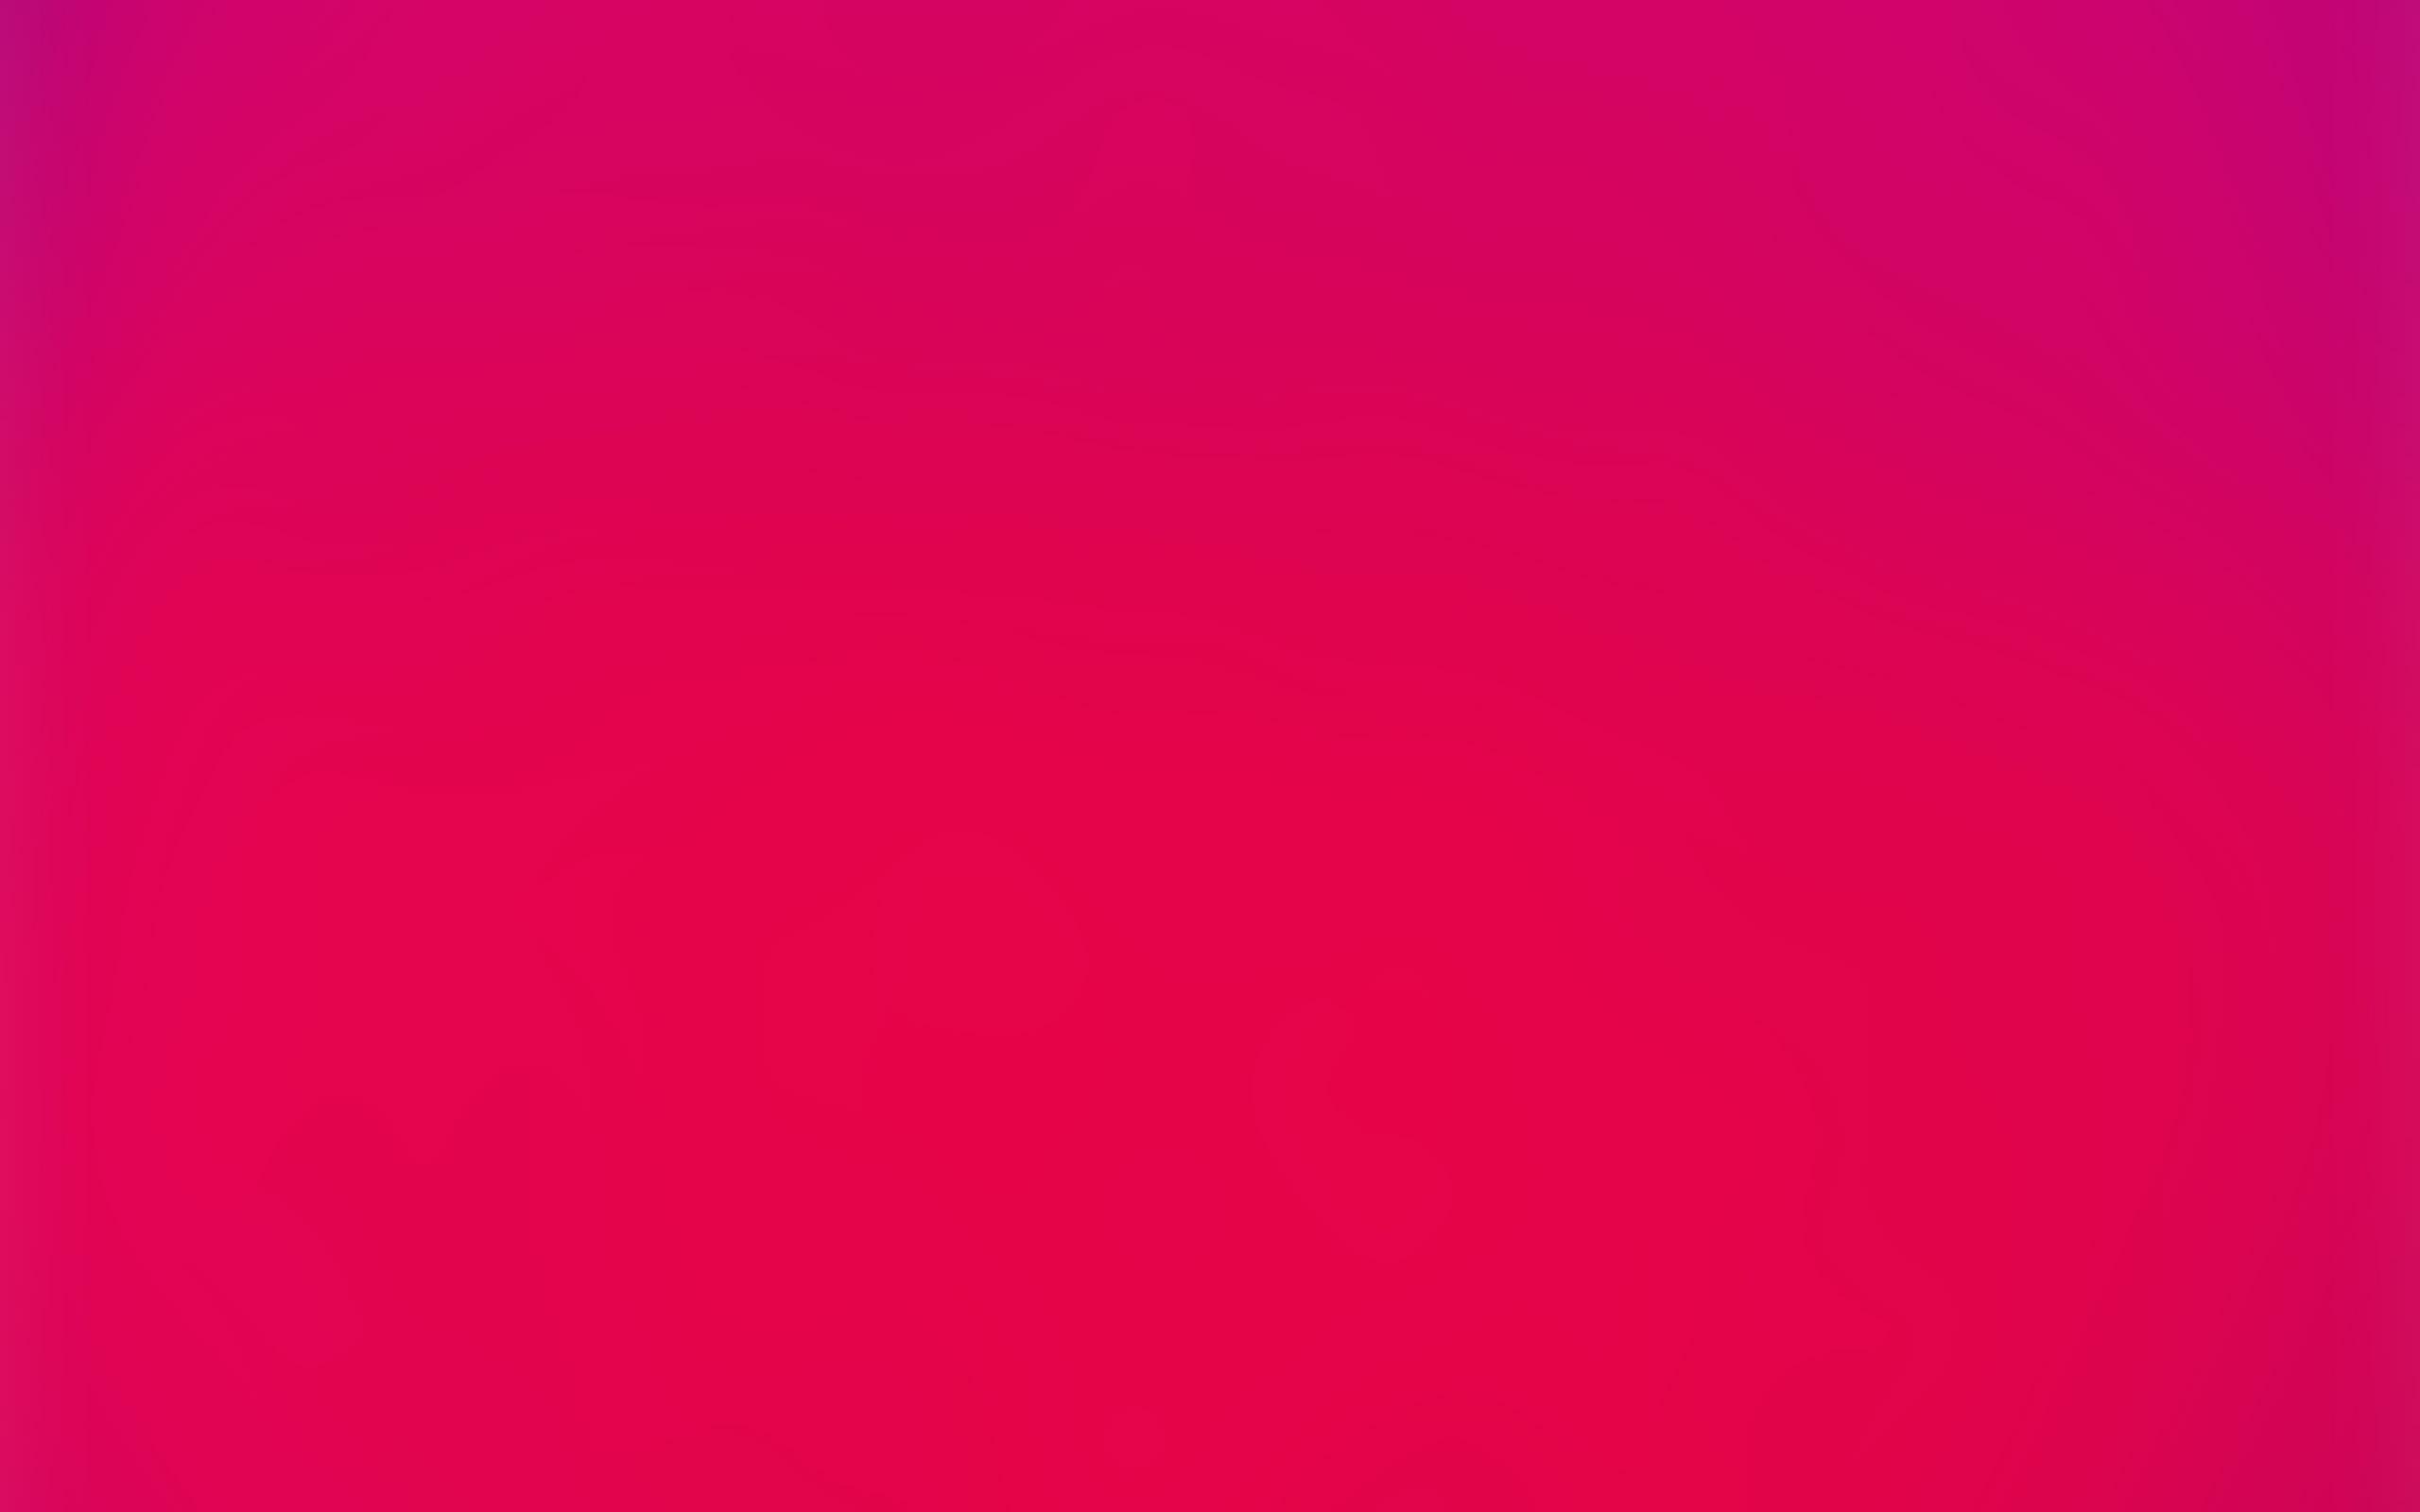 Victoria Secret Wallpaper Iphone 5 Macbook Pro 13